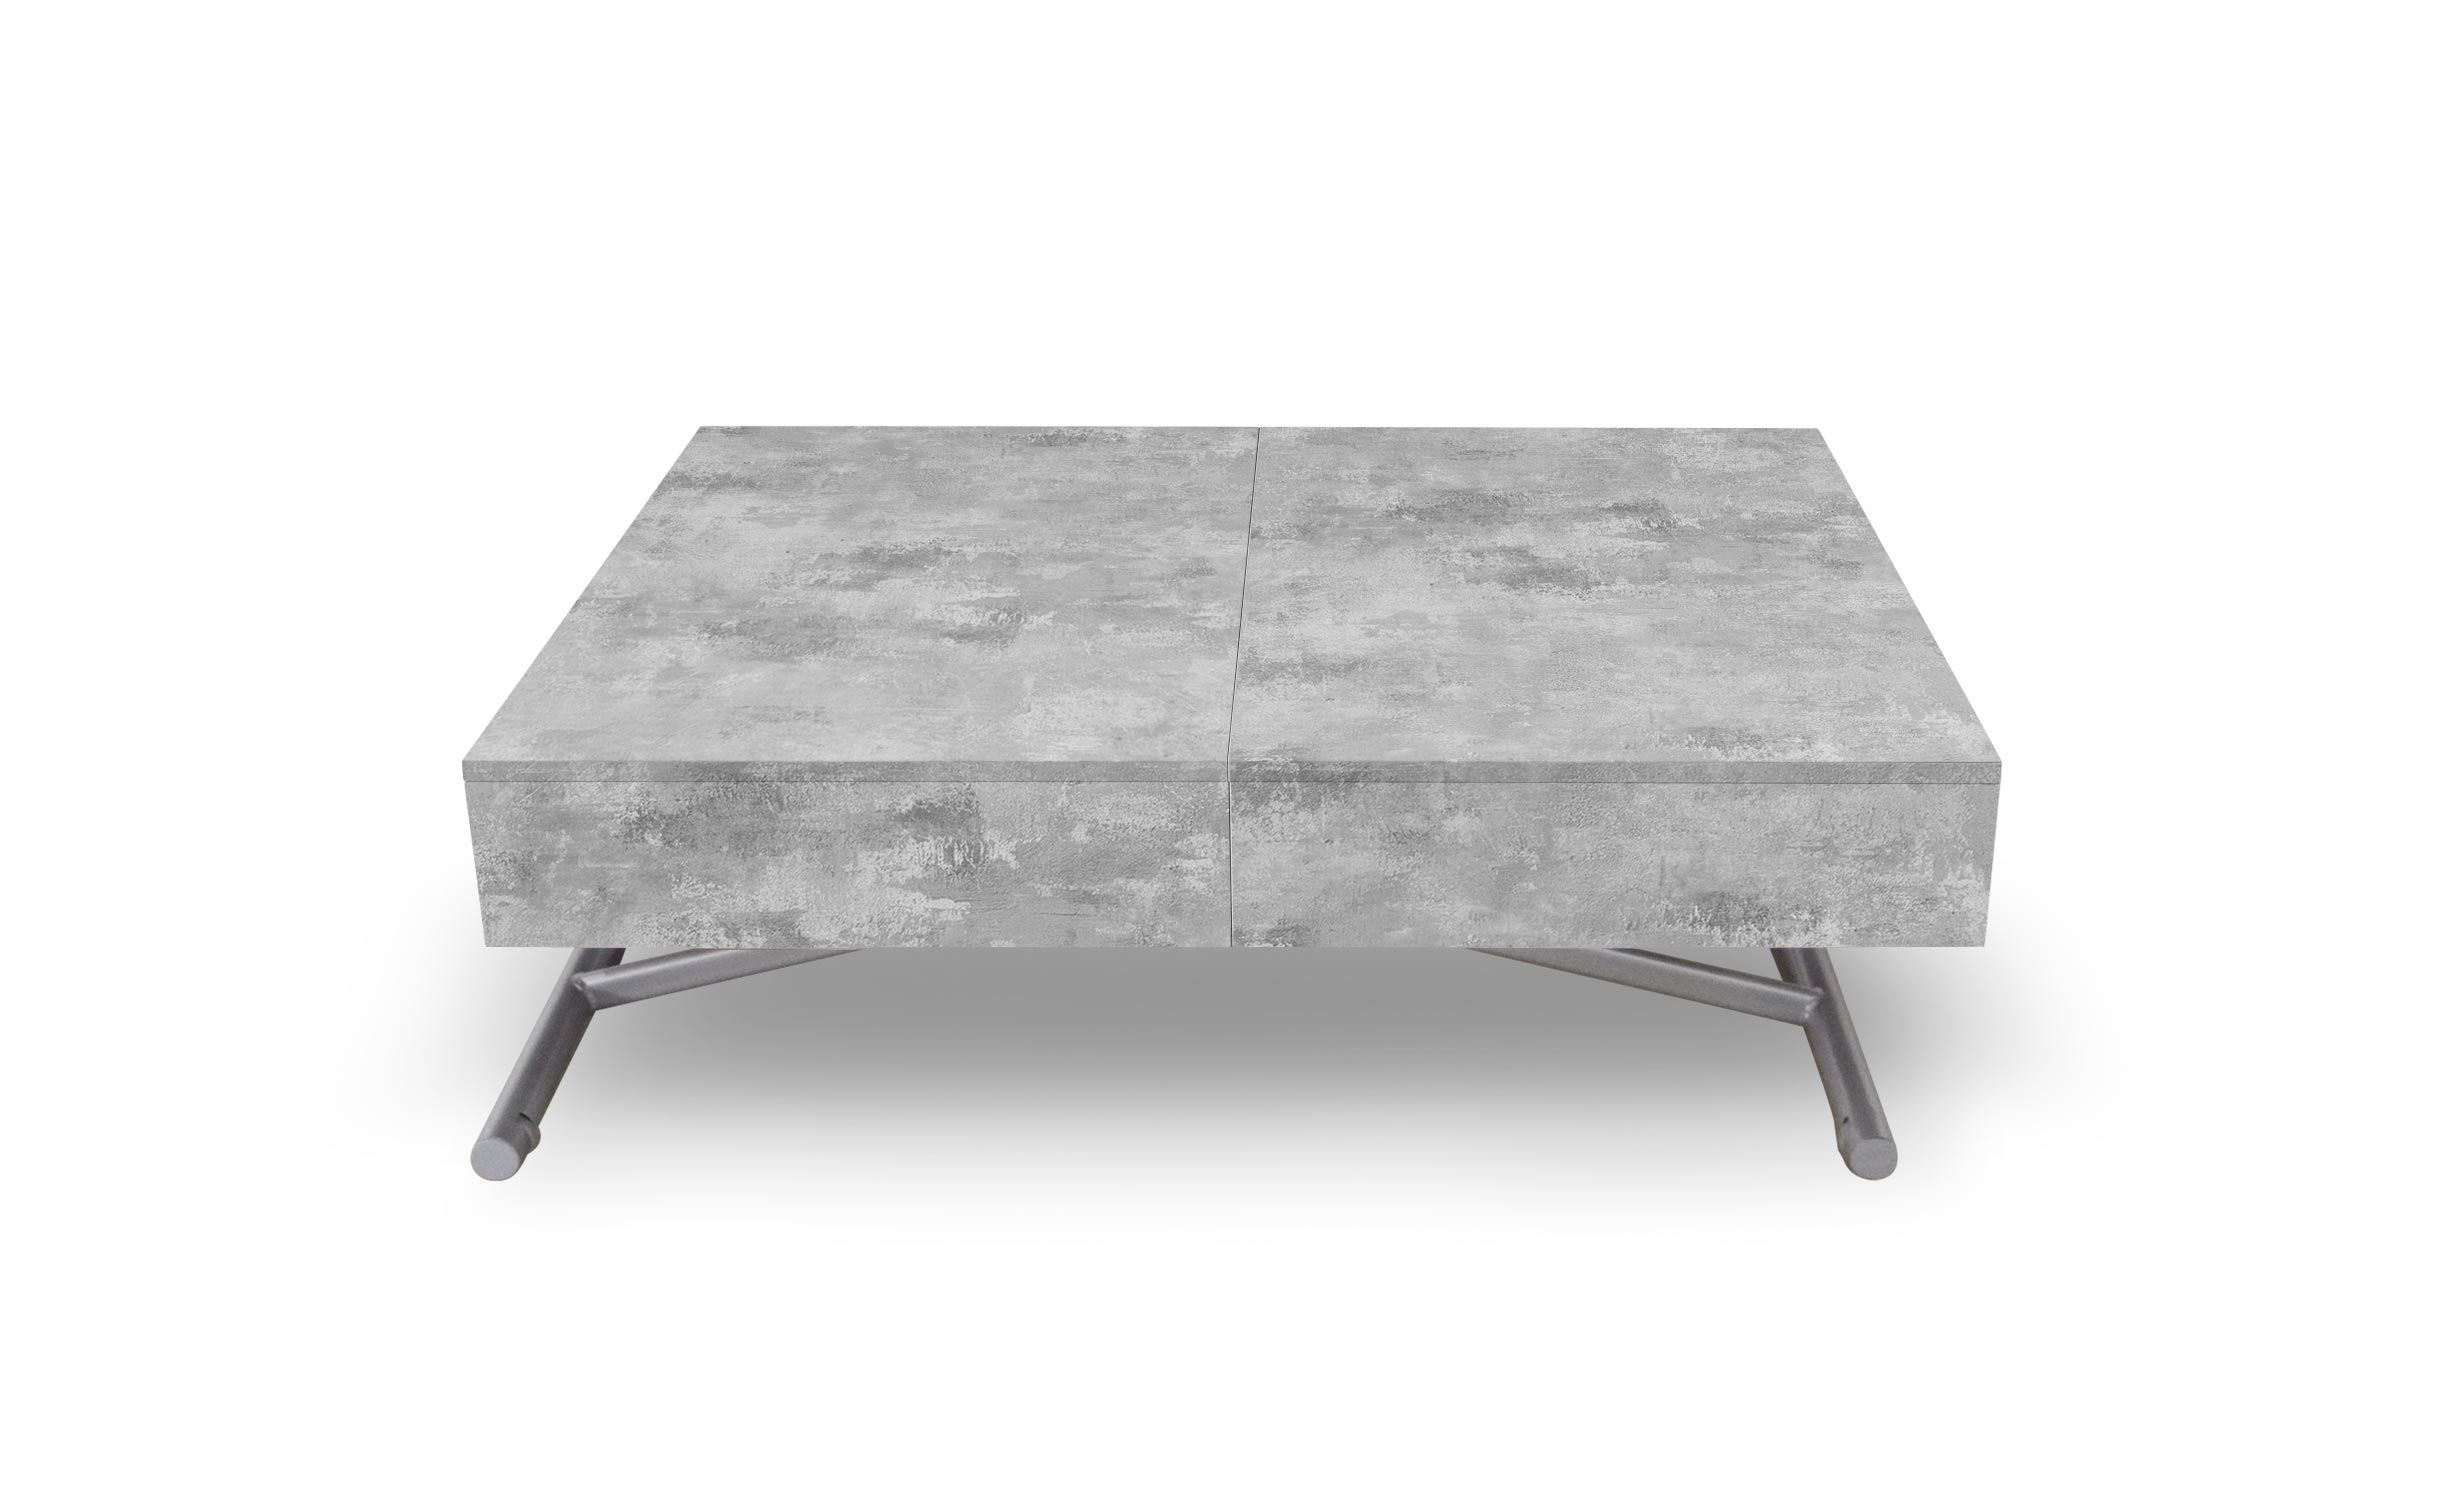 Table Basse Relevable Sundance Effet Beton En 2020 Table Basse Relevable Table Basse Et Table